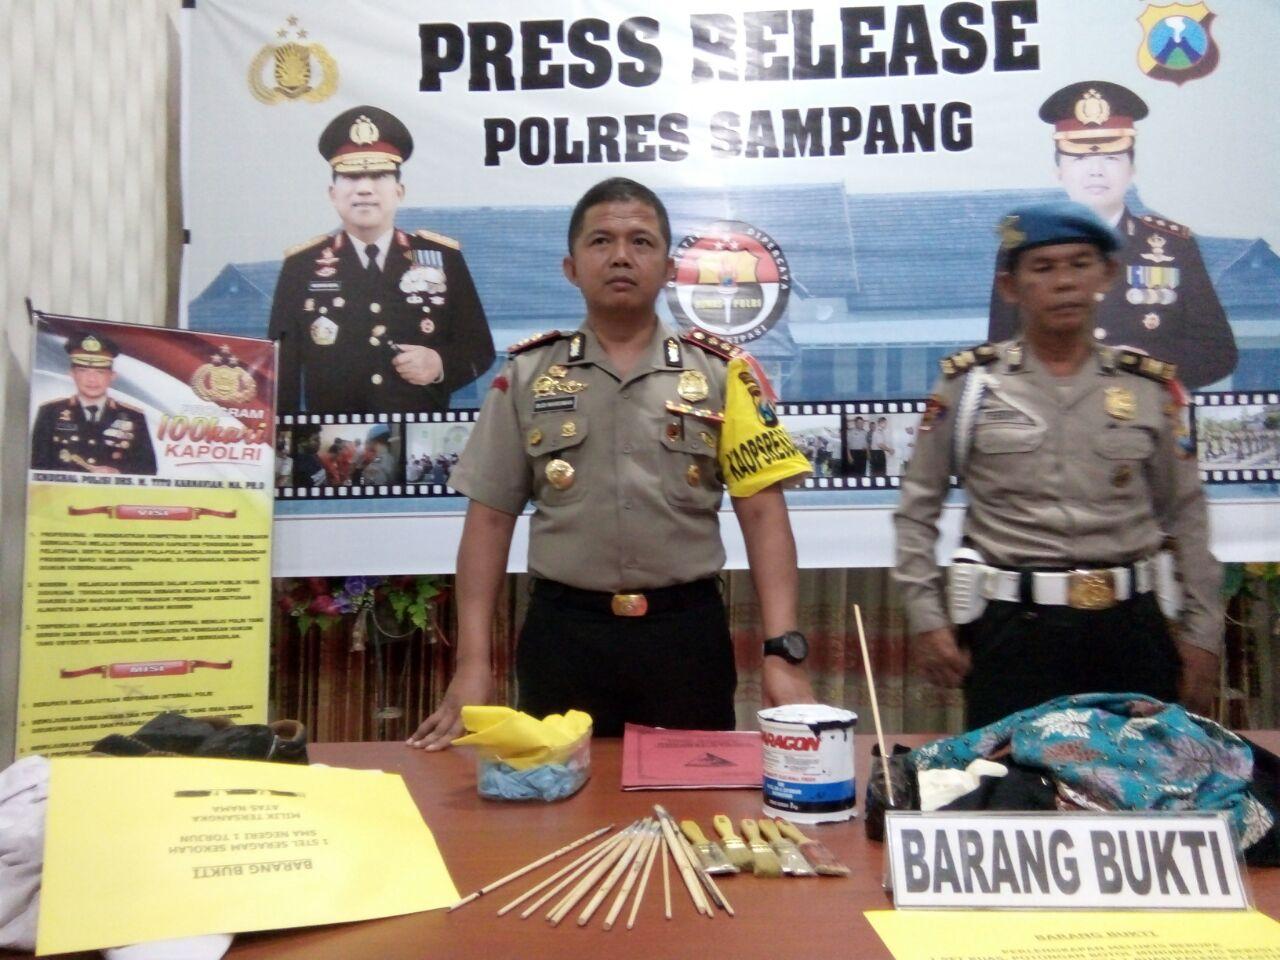 Murid Penganiaya Guru di Sampang Ditetapkan Sebagai Tersangka